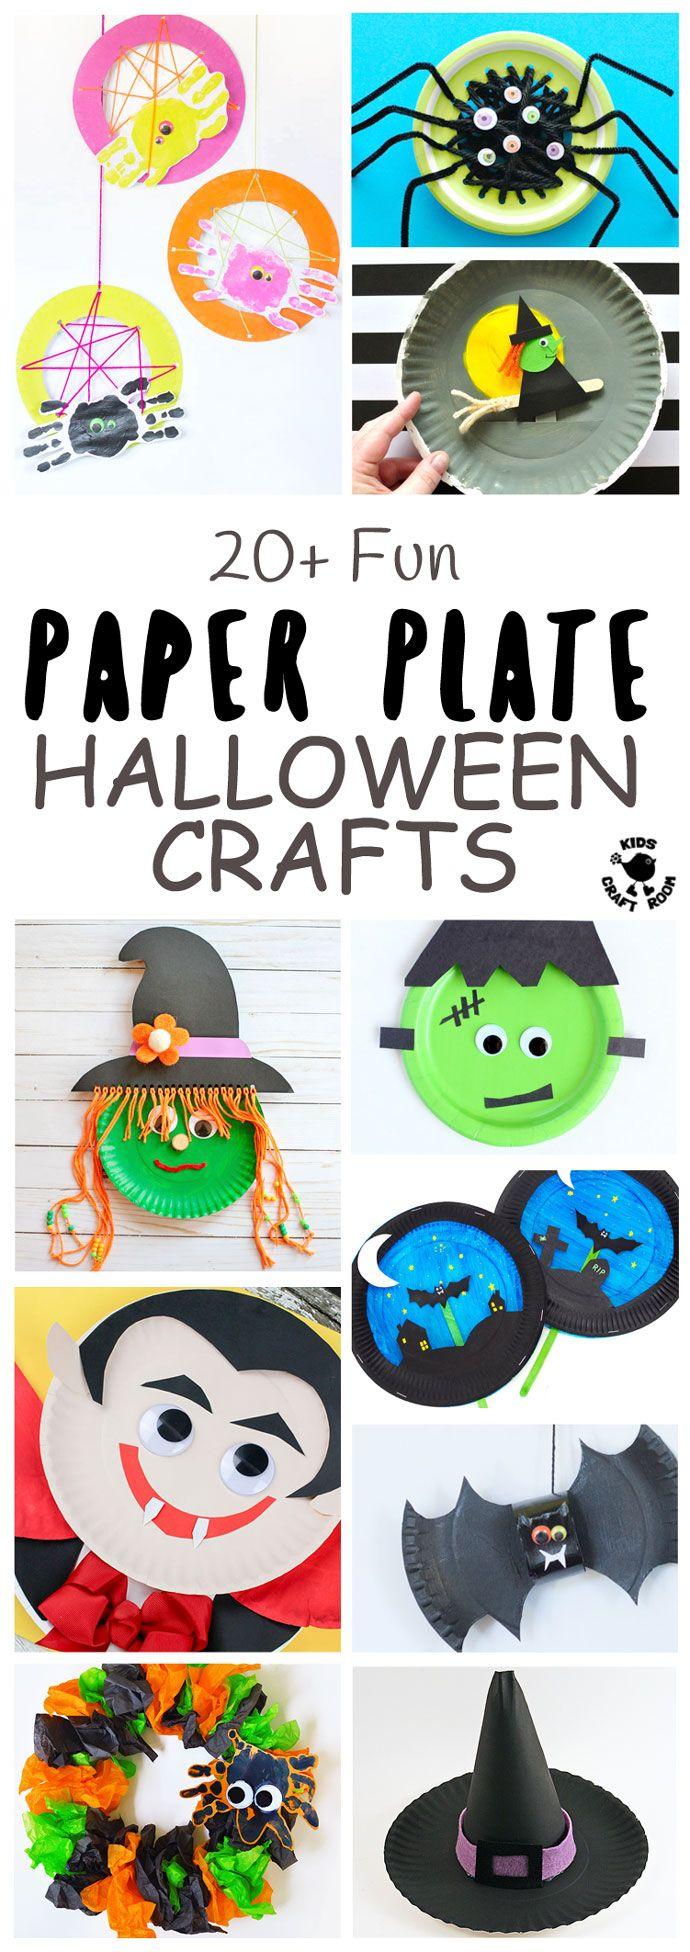 20+ Fun Paper Plate Halloween Crafts | Paper plate crafts ...